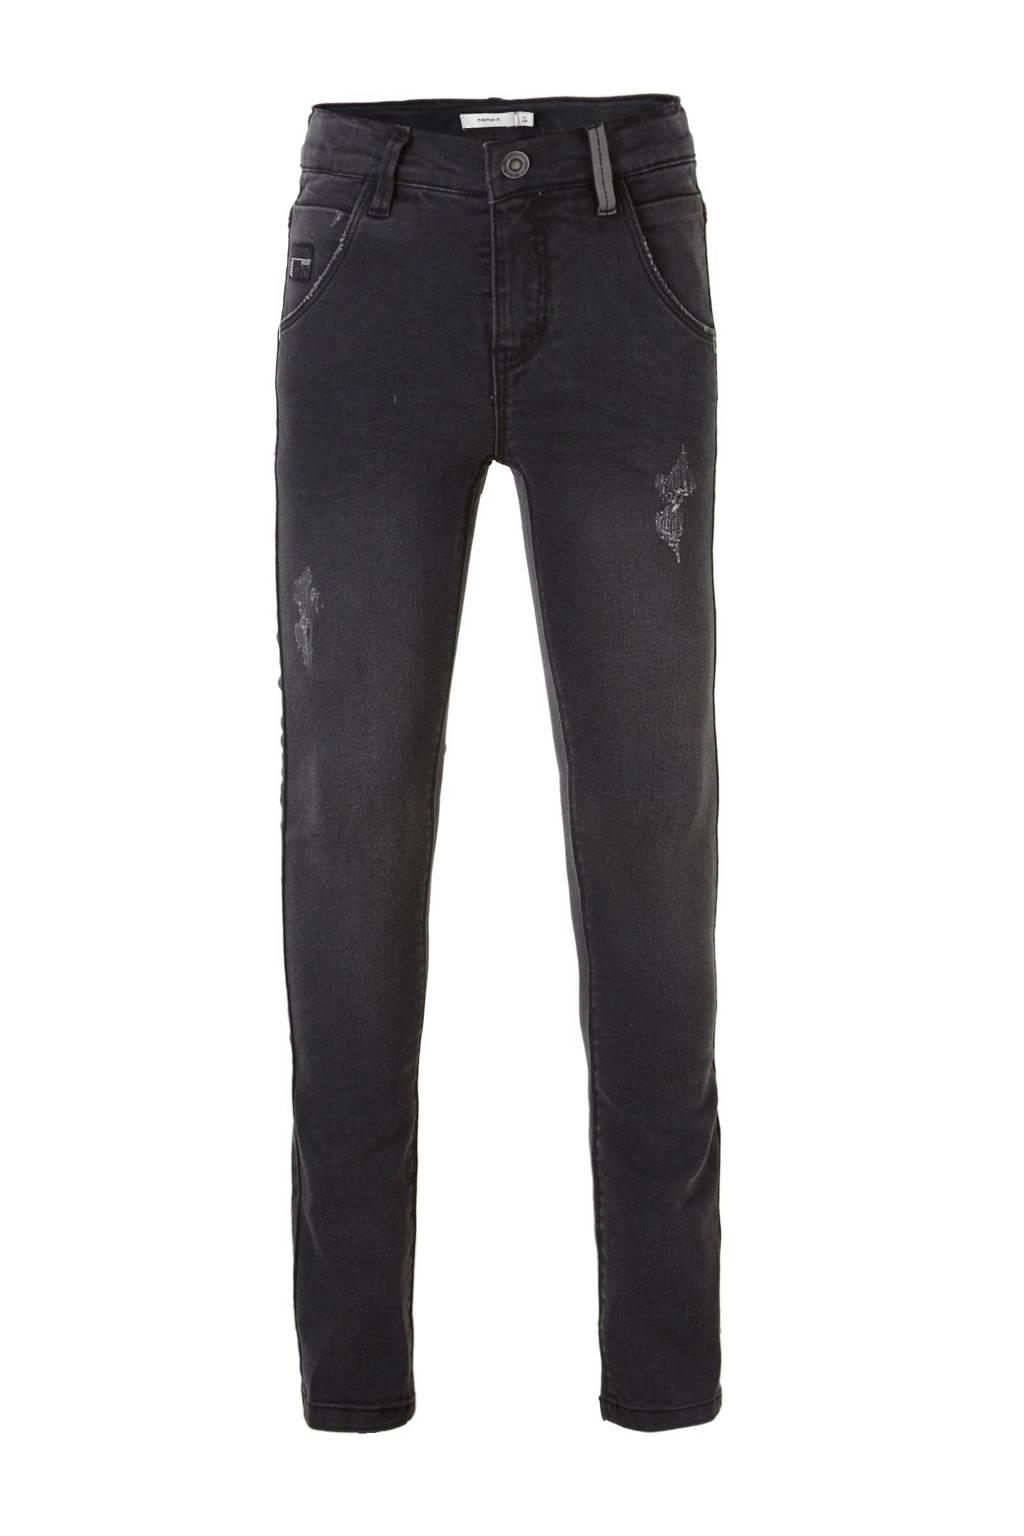 NAME IT KIDS Nittrap skinny fit jeans, Dark grey denim